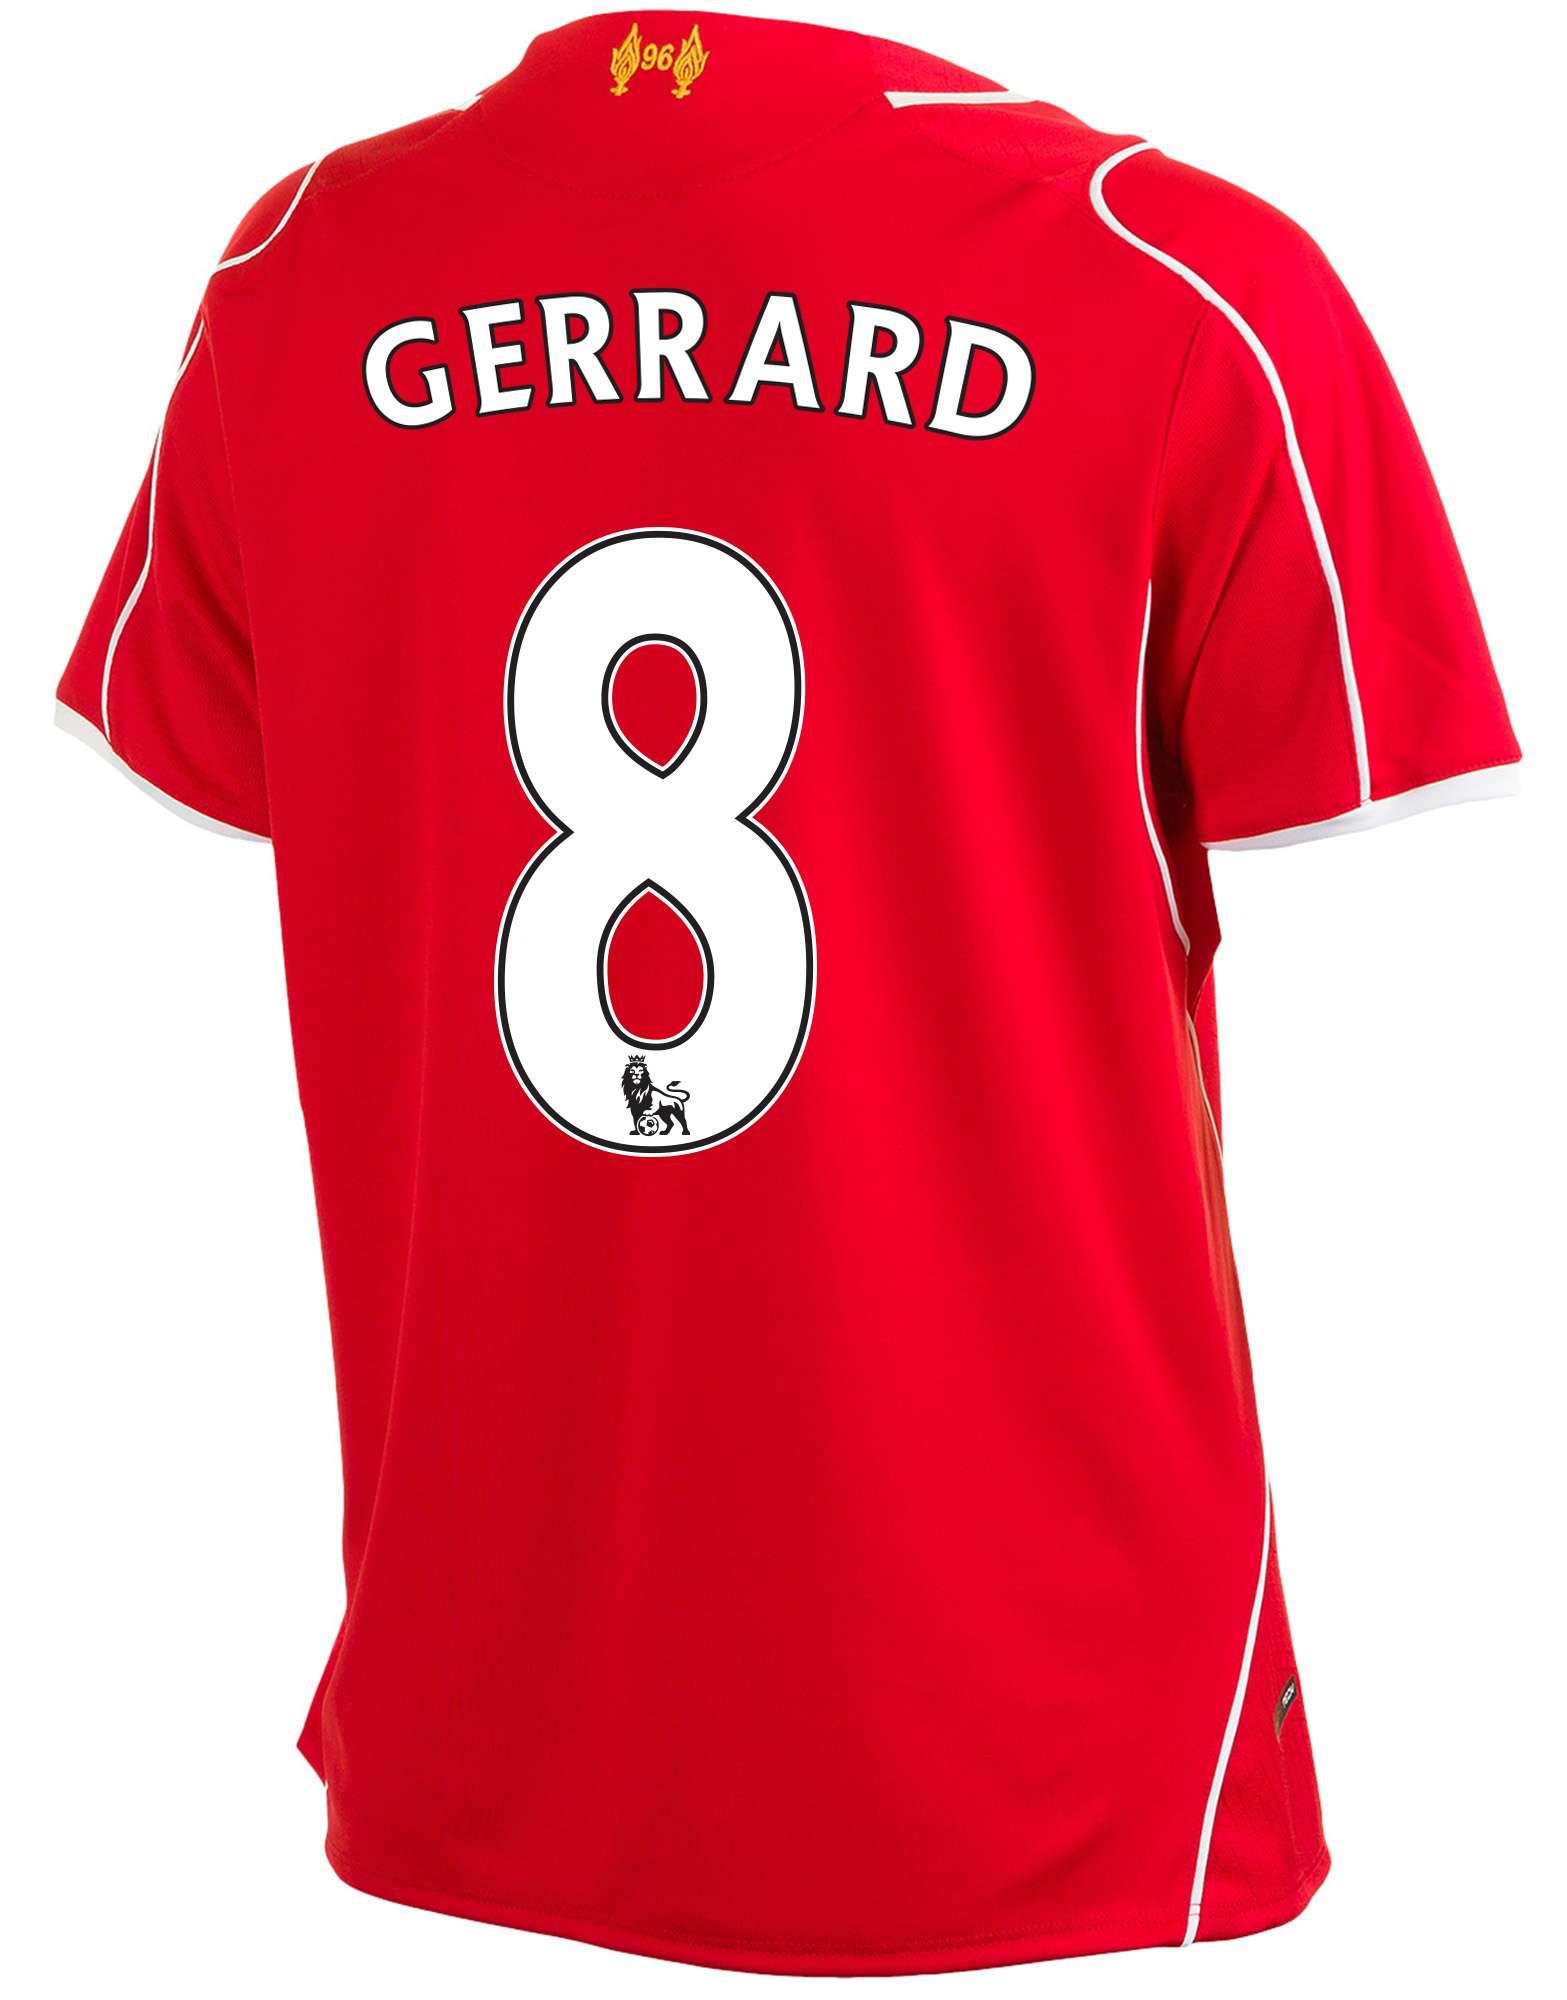 Warrior Sports Liverpool 2014 Junior Gerrard Home Shirt